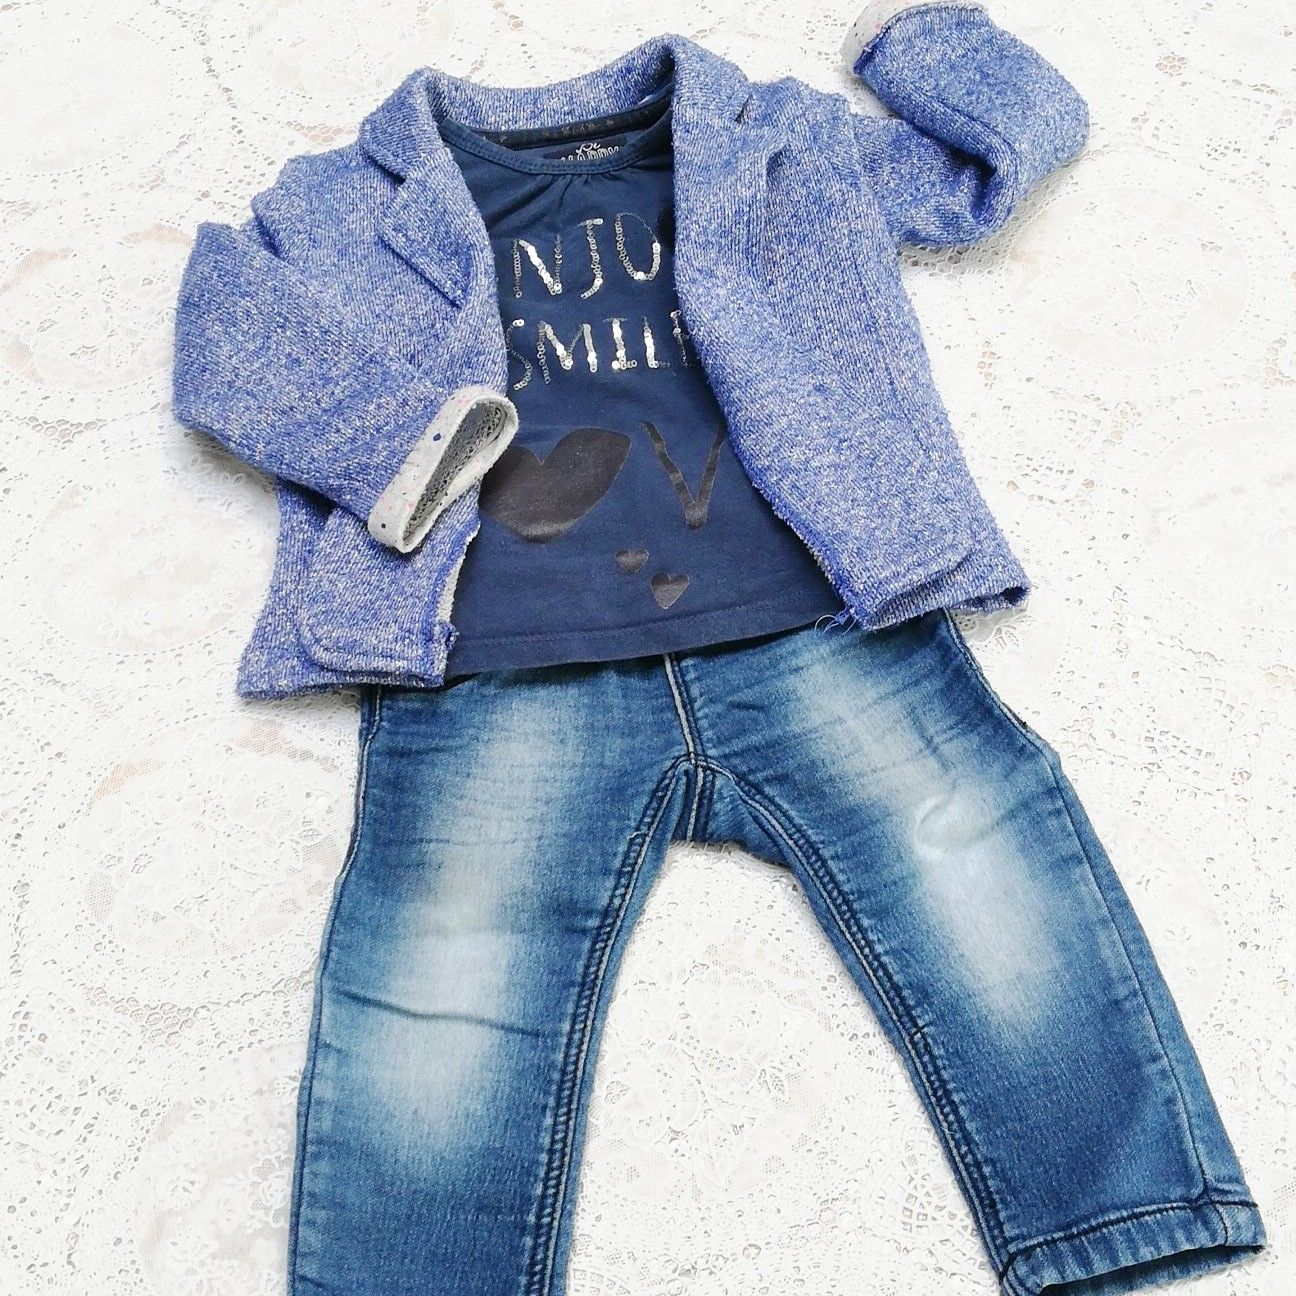 Tweedehands Merk Kinderkleding.Bij Sanne Verkoop Tweedehands Merk Kinderkleding Tweedehands